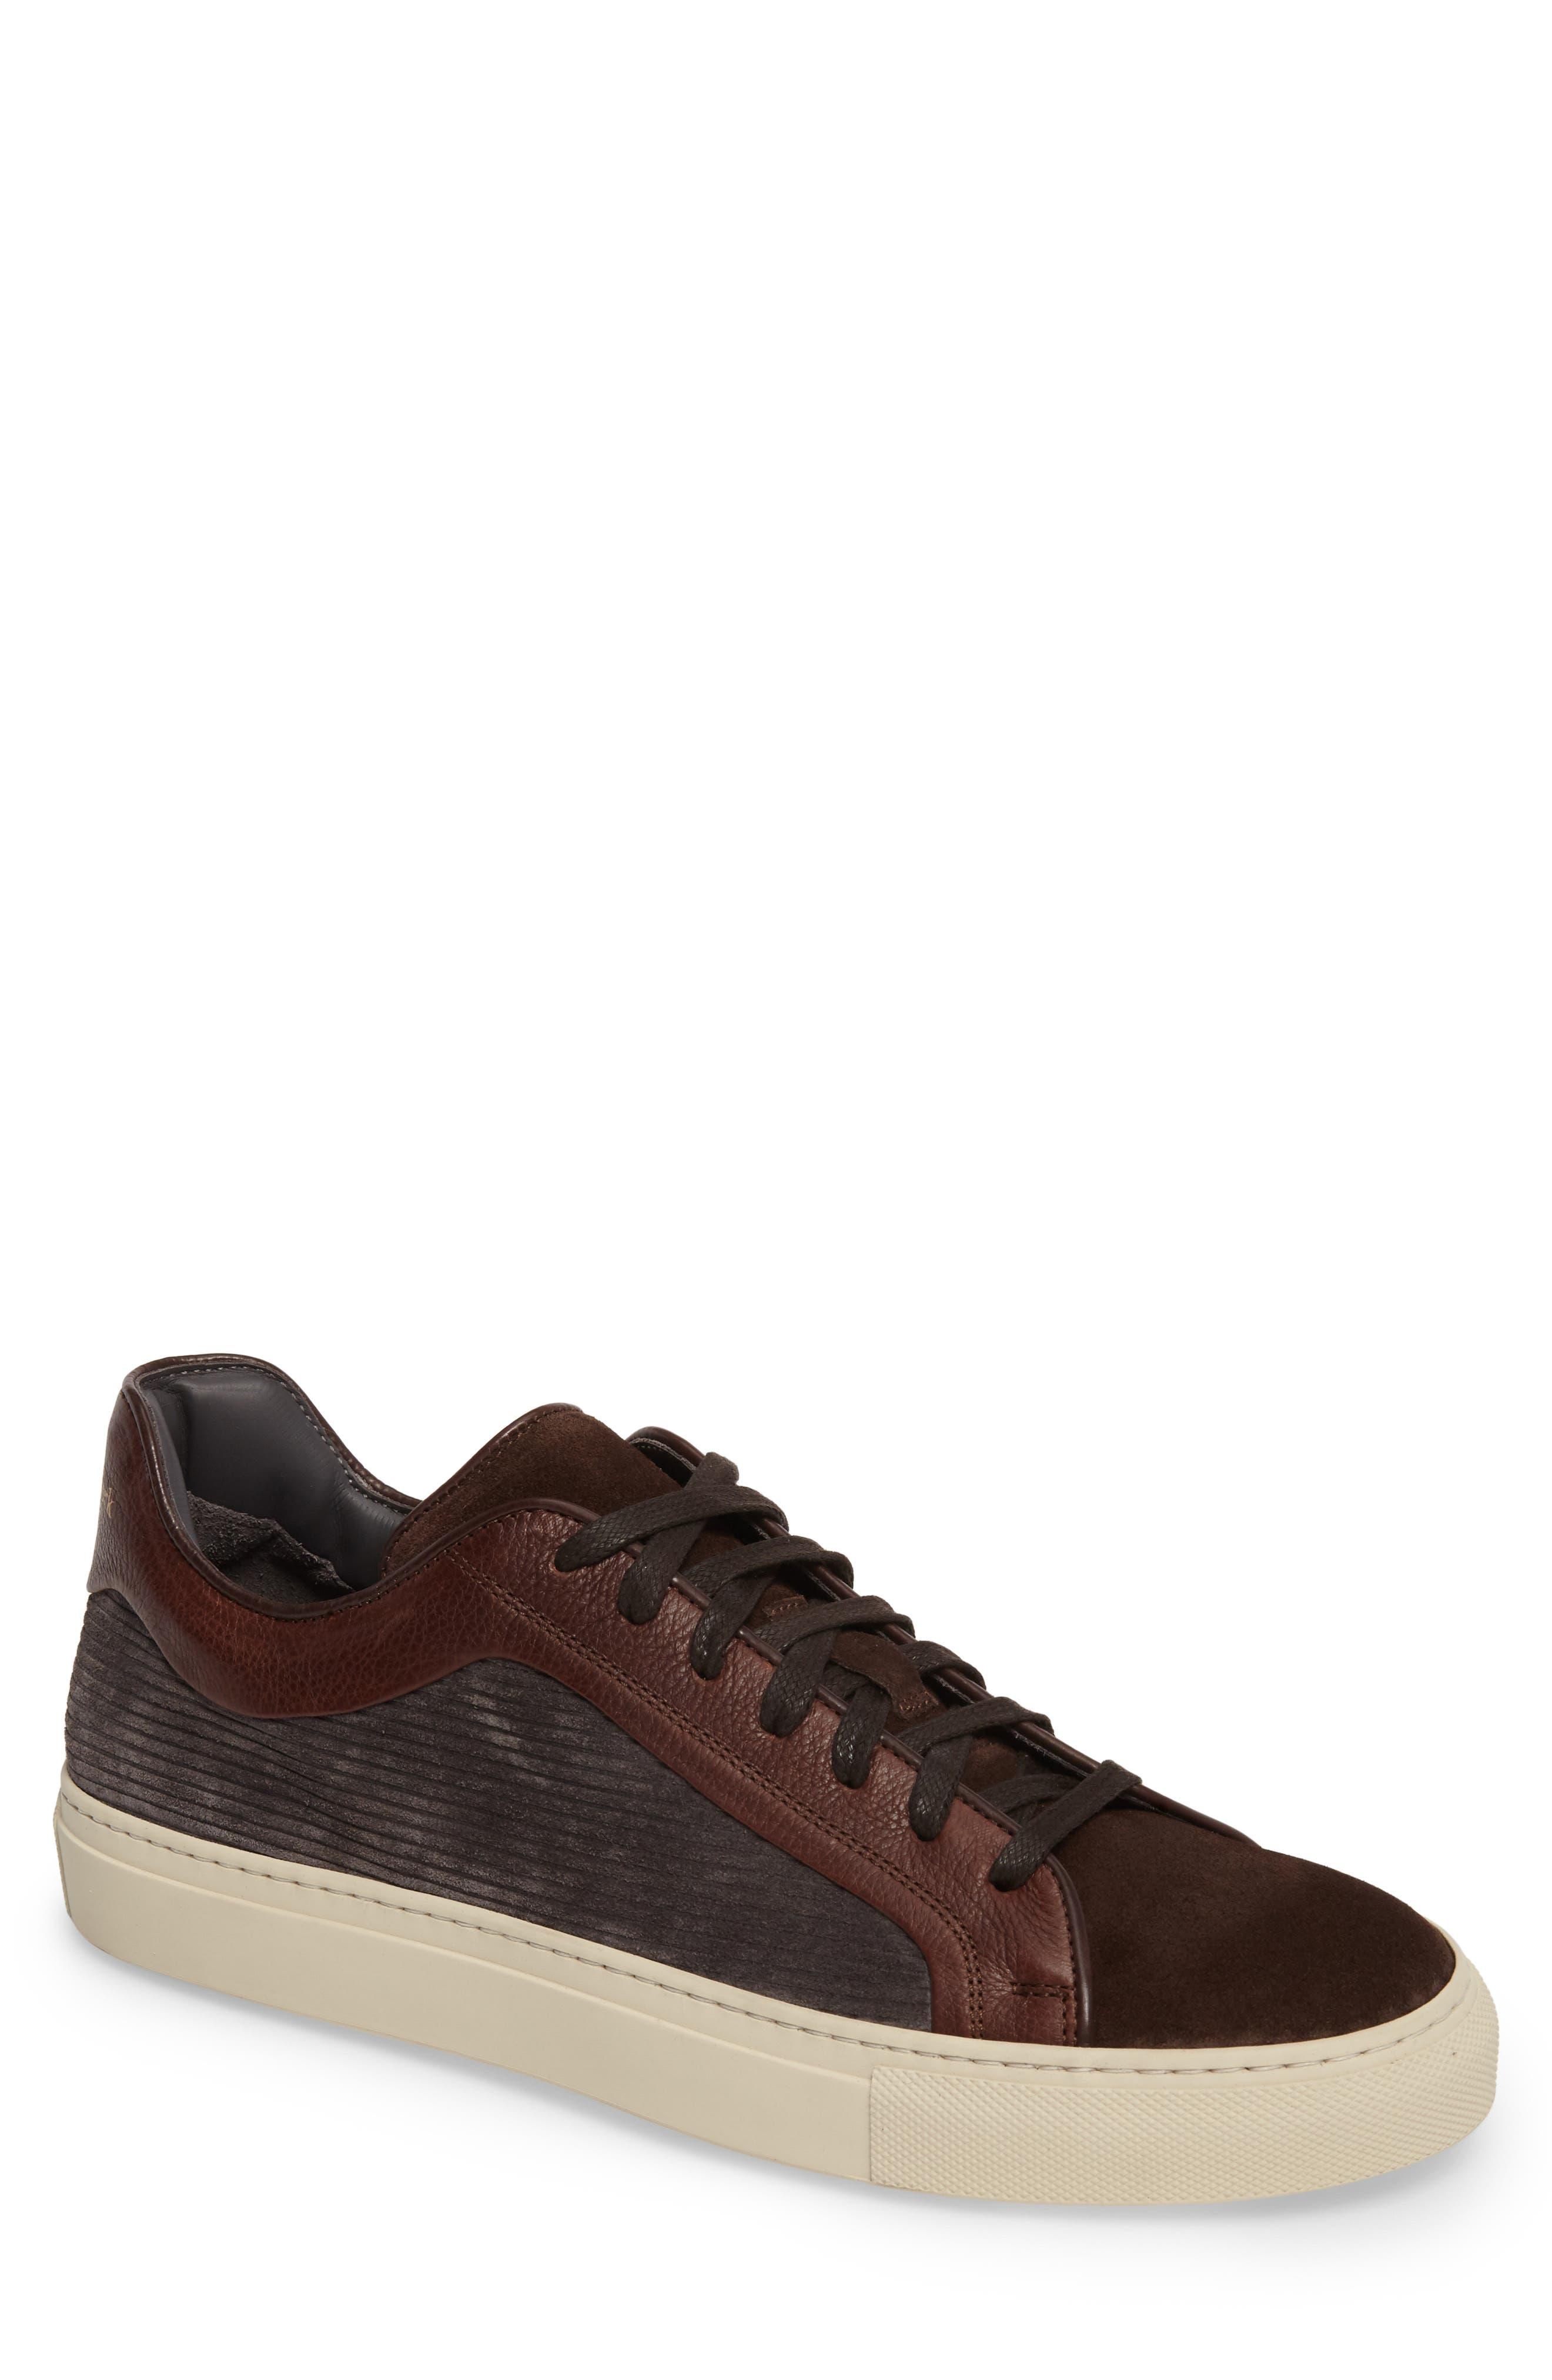 Marshall Sneaker,                             Main thumbnail 4, color,